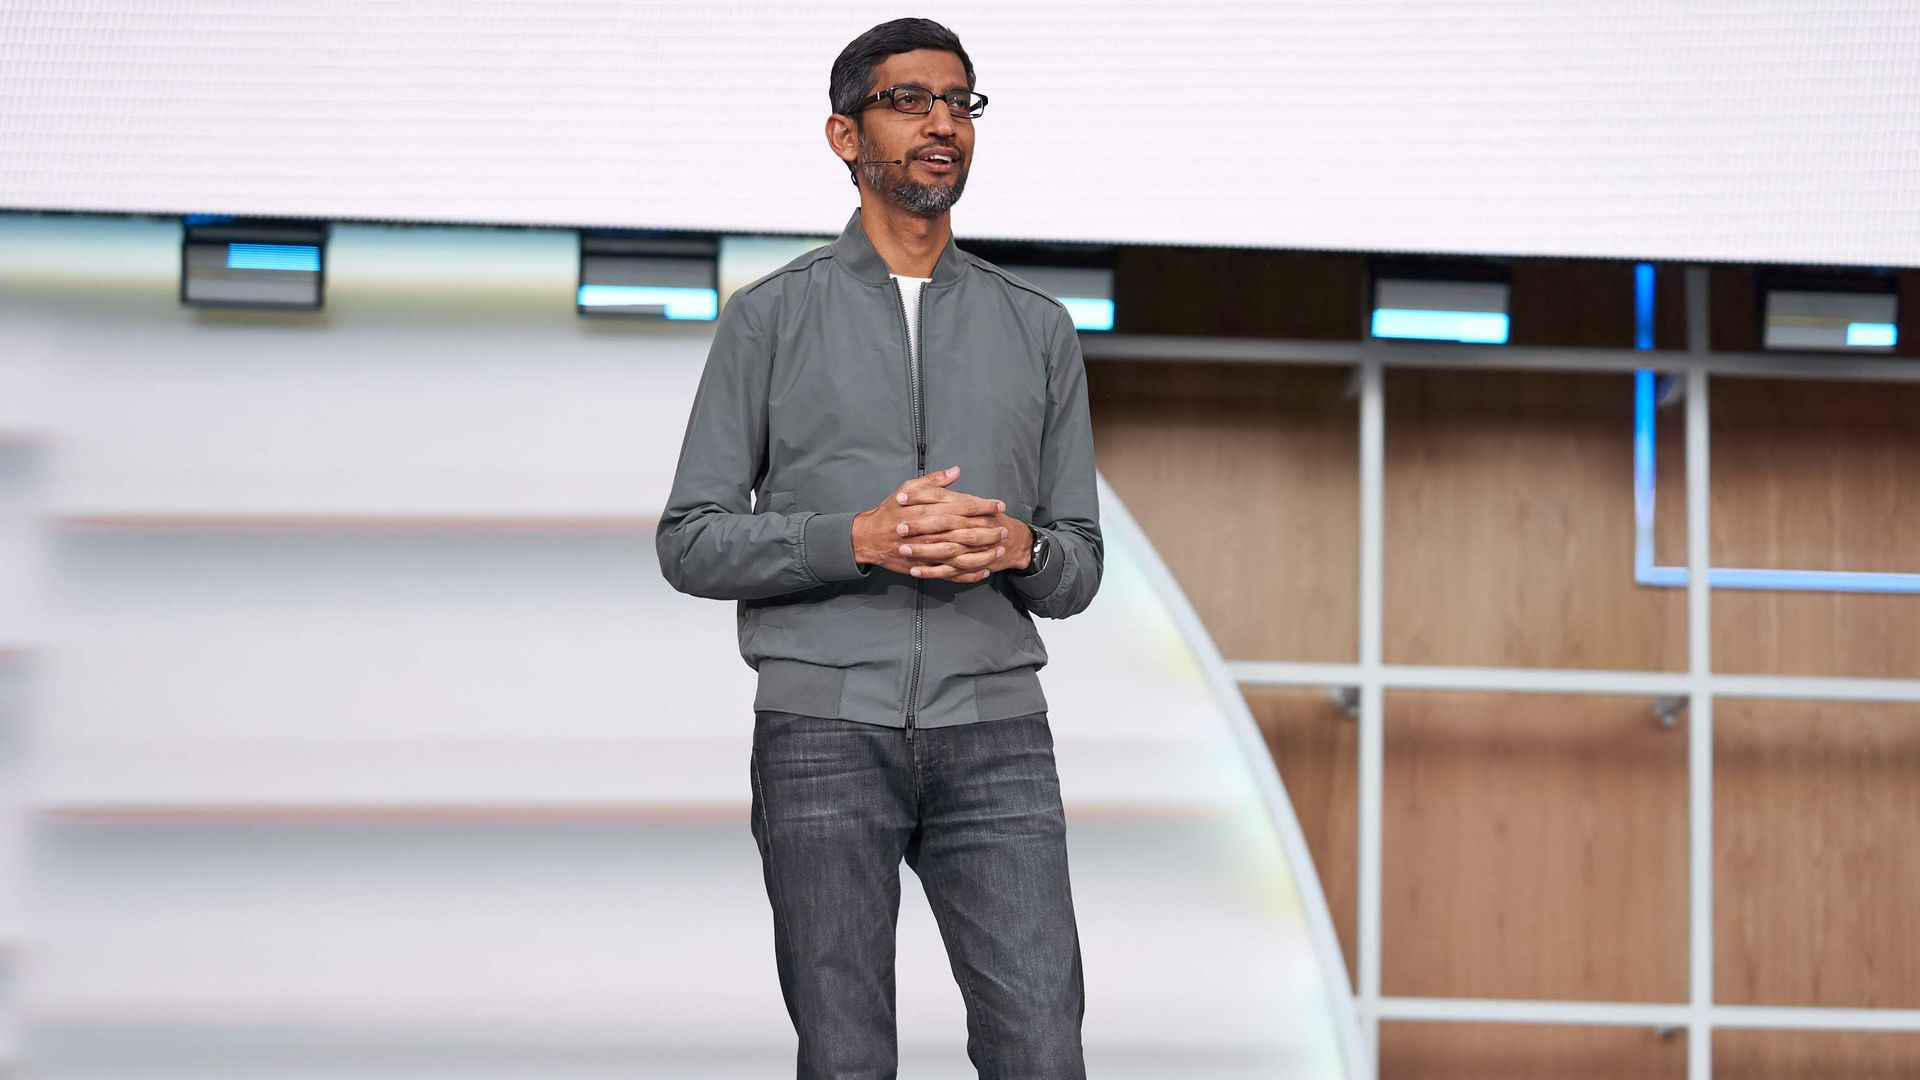 Google's Sundar Pichai speaking at their developer conference Tuesday